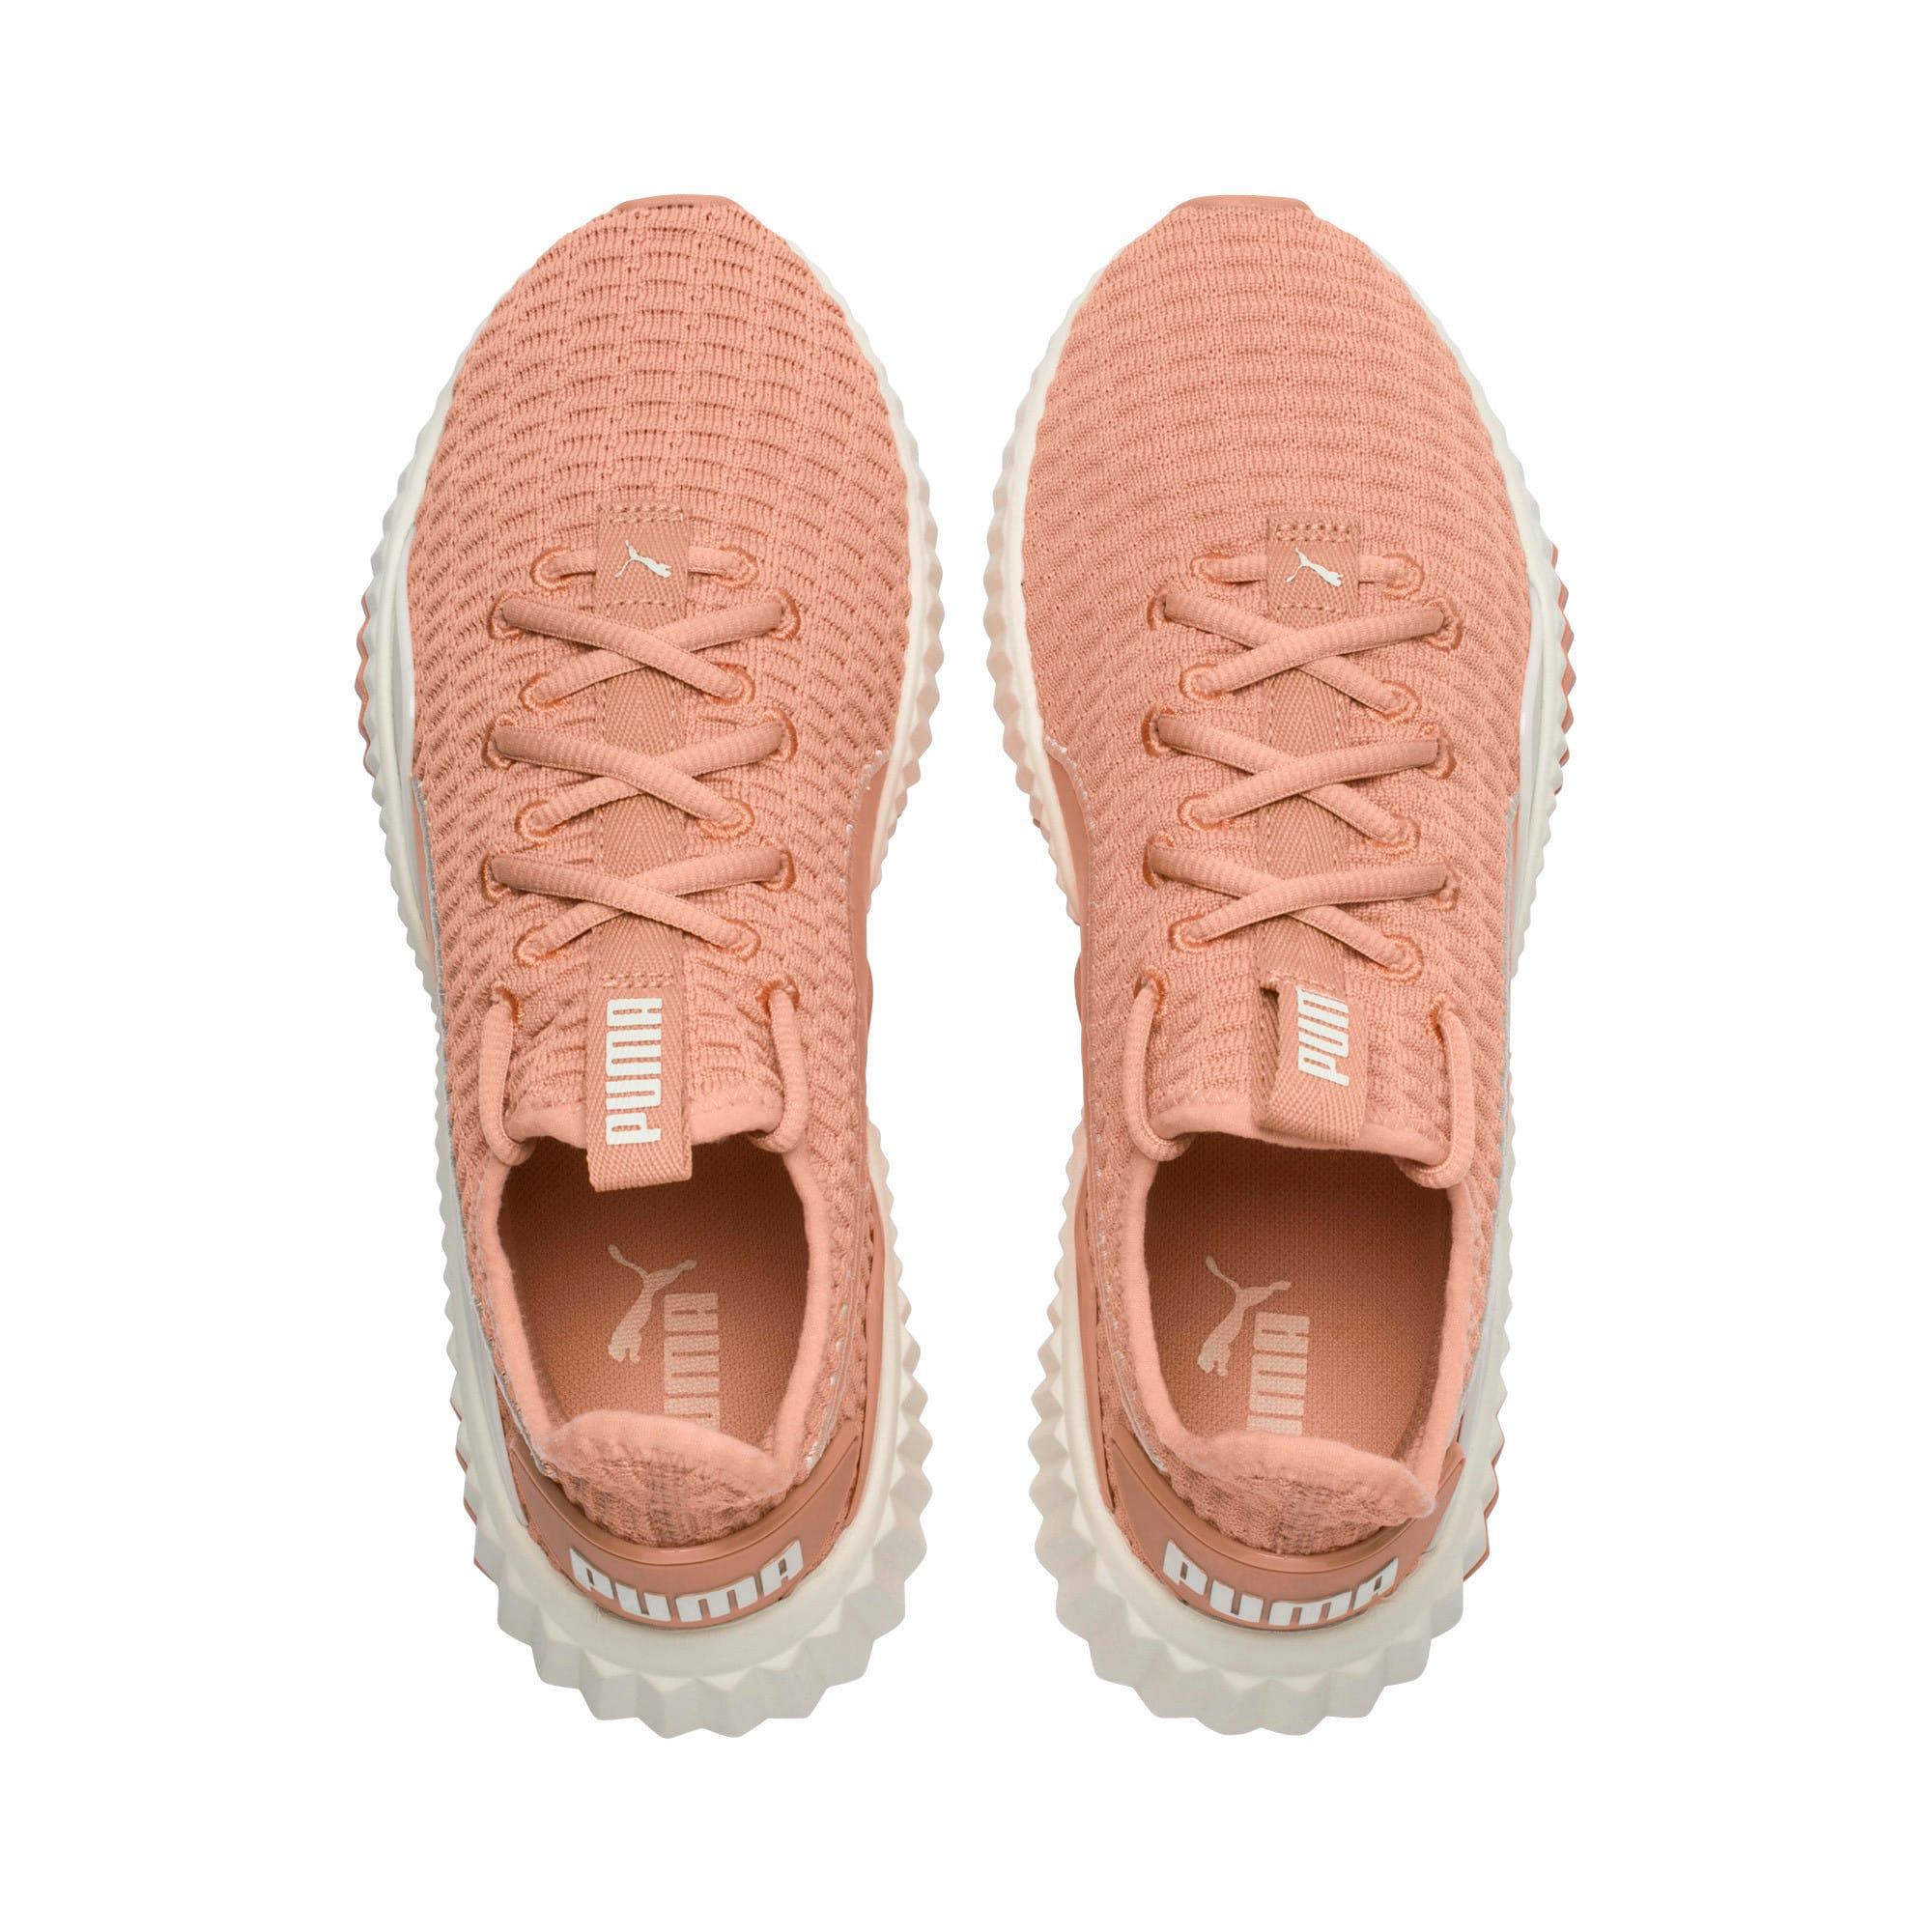 Thumbnail 6 of Defy Women's Training Shoes, Dusty Coral-Whisper White, medium